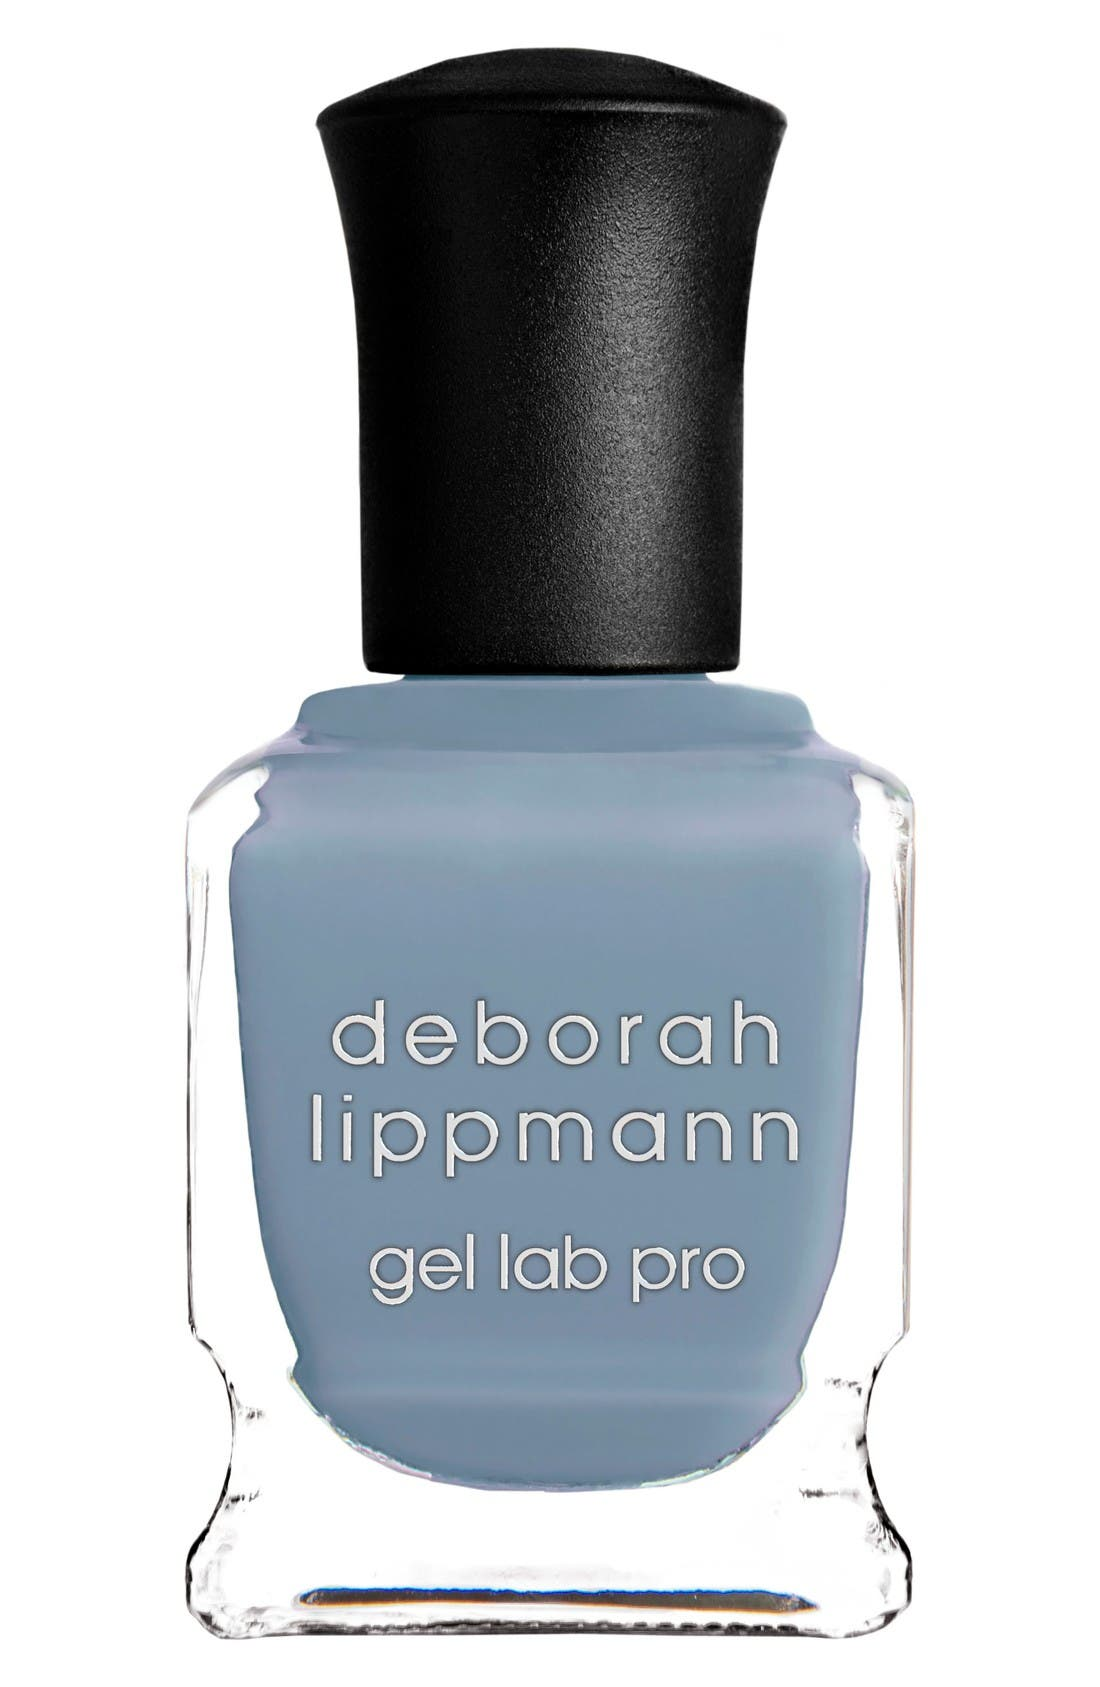 Alternate Image 1 Selected - Deborah Lippmann Message in a Bottle Gel Lab Pro Nail Color